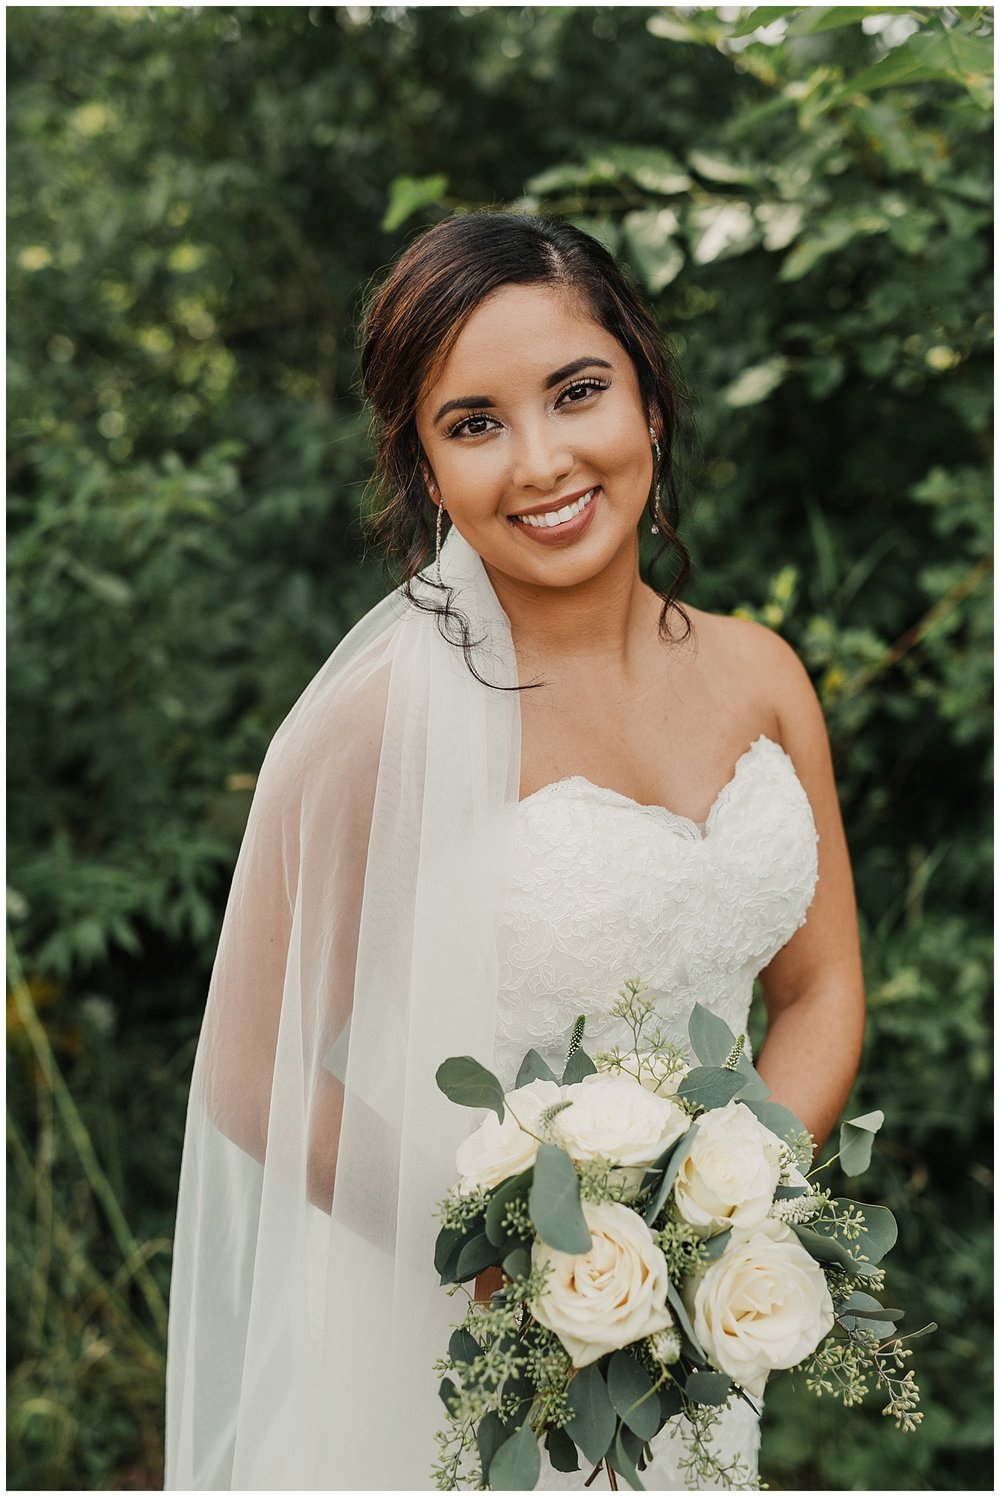 lindybeth photography - huisinga wedding - gable hill - blog-69.jpg